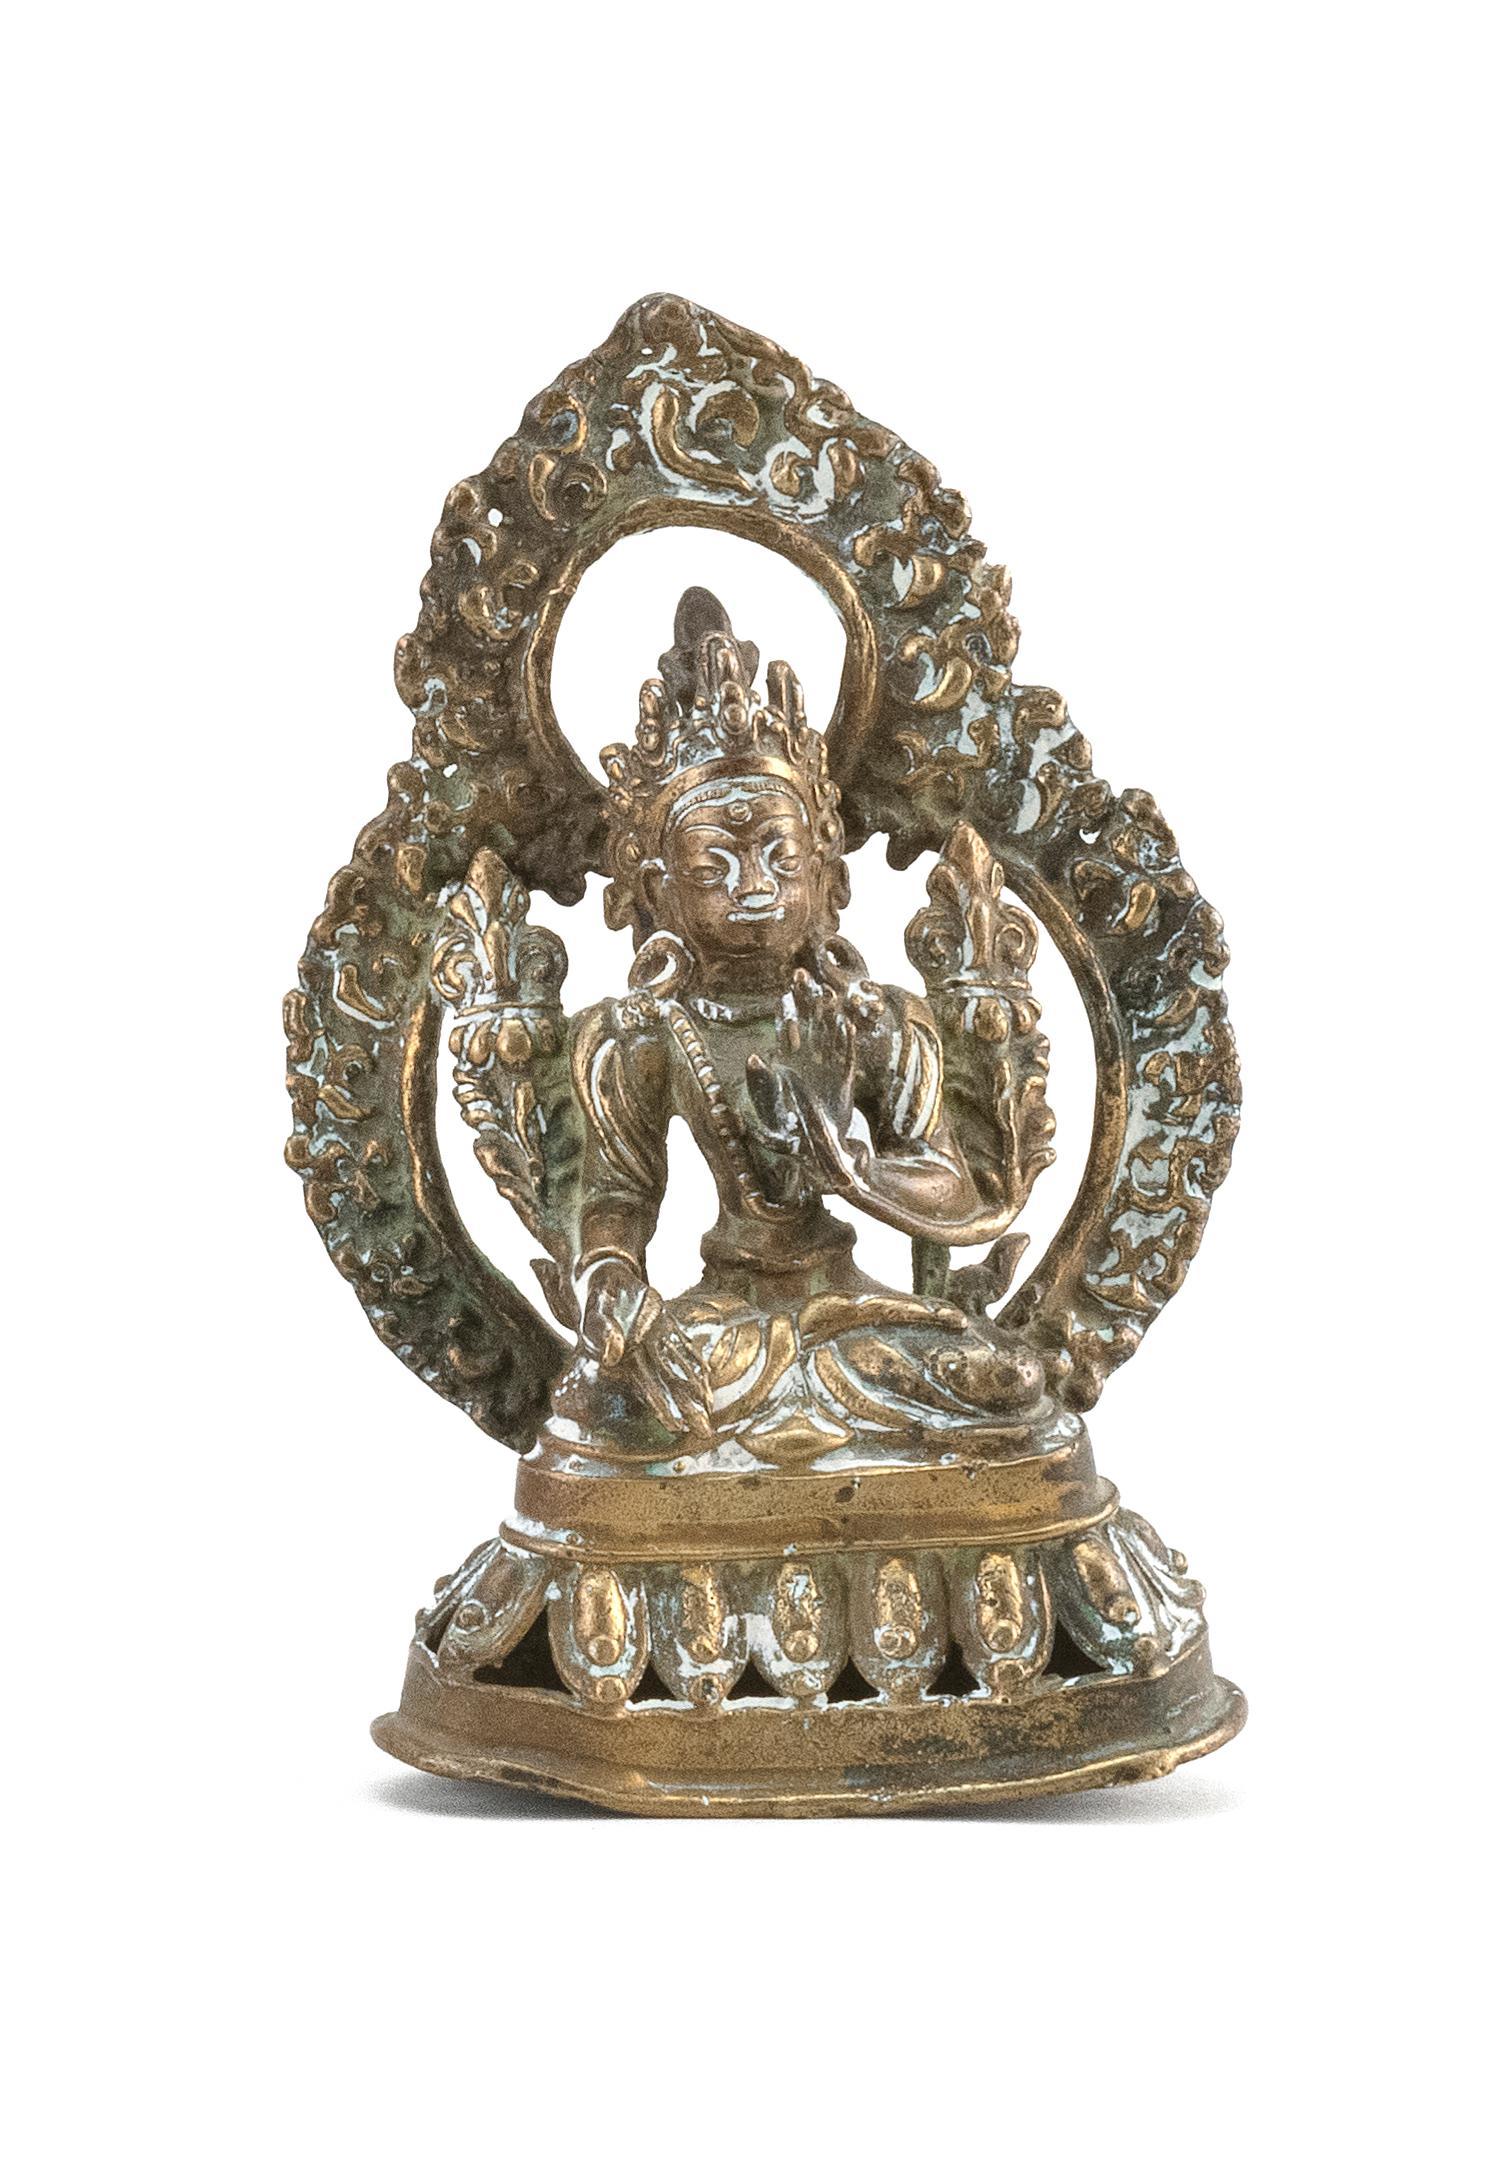 "BRONZE FIGURE OF TARA Seated on a lotus throne with openwork mandala. Height 5""."